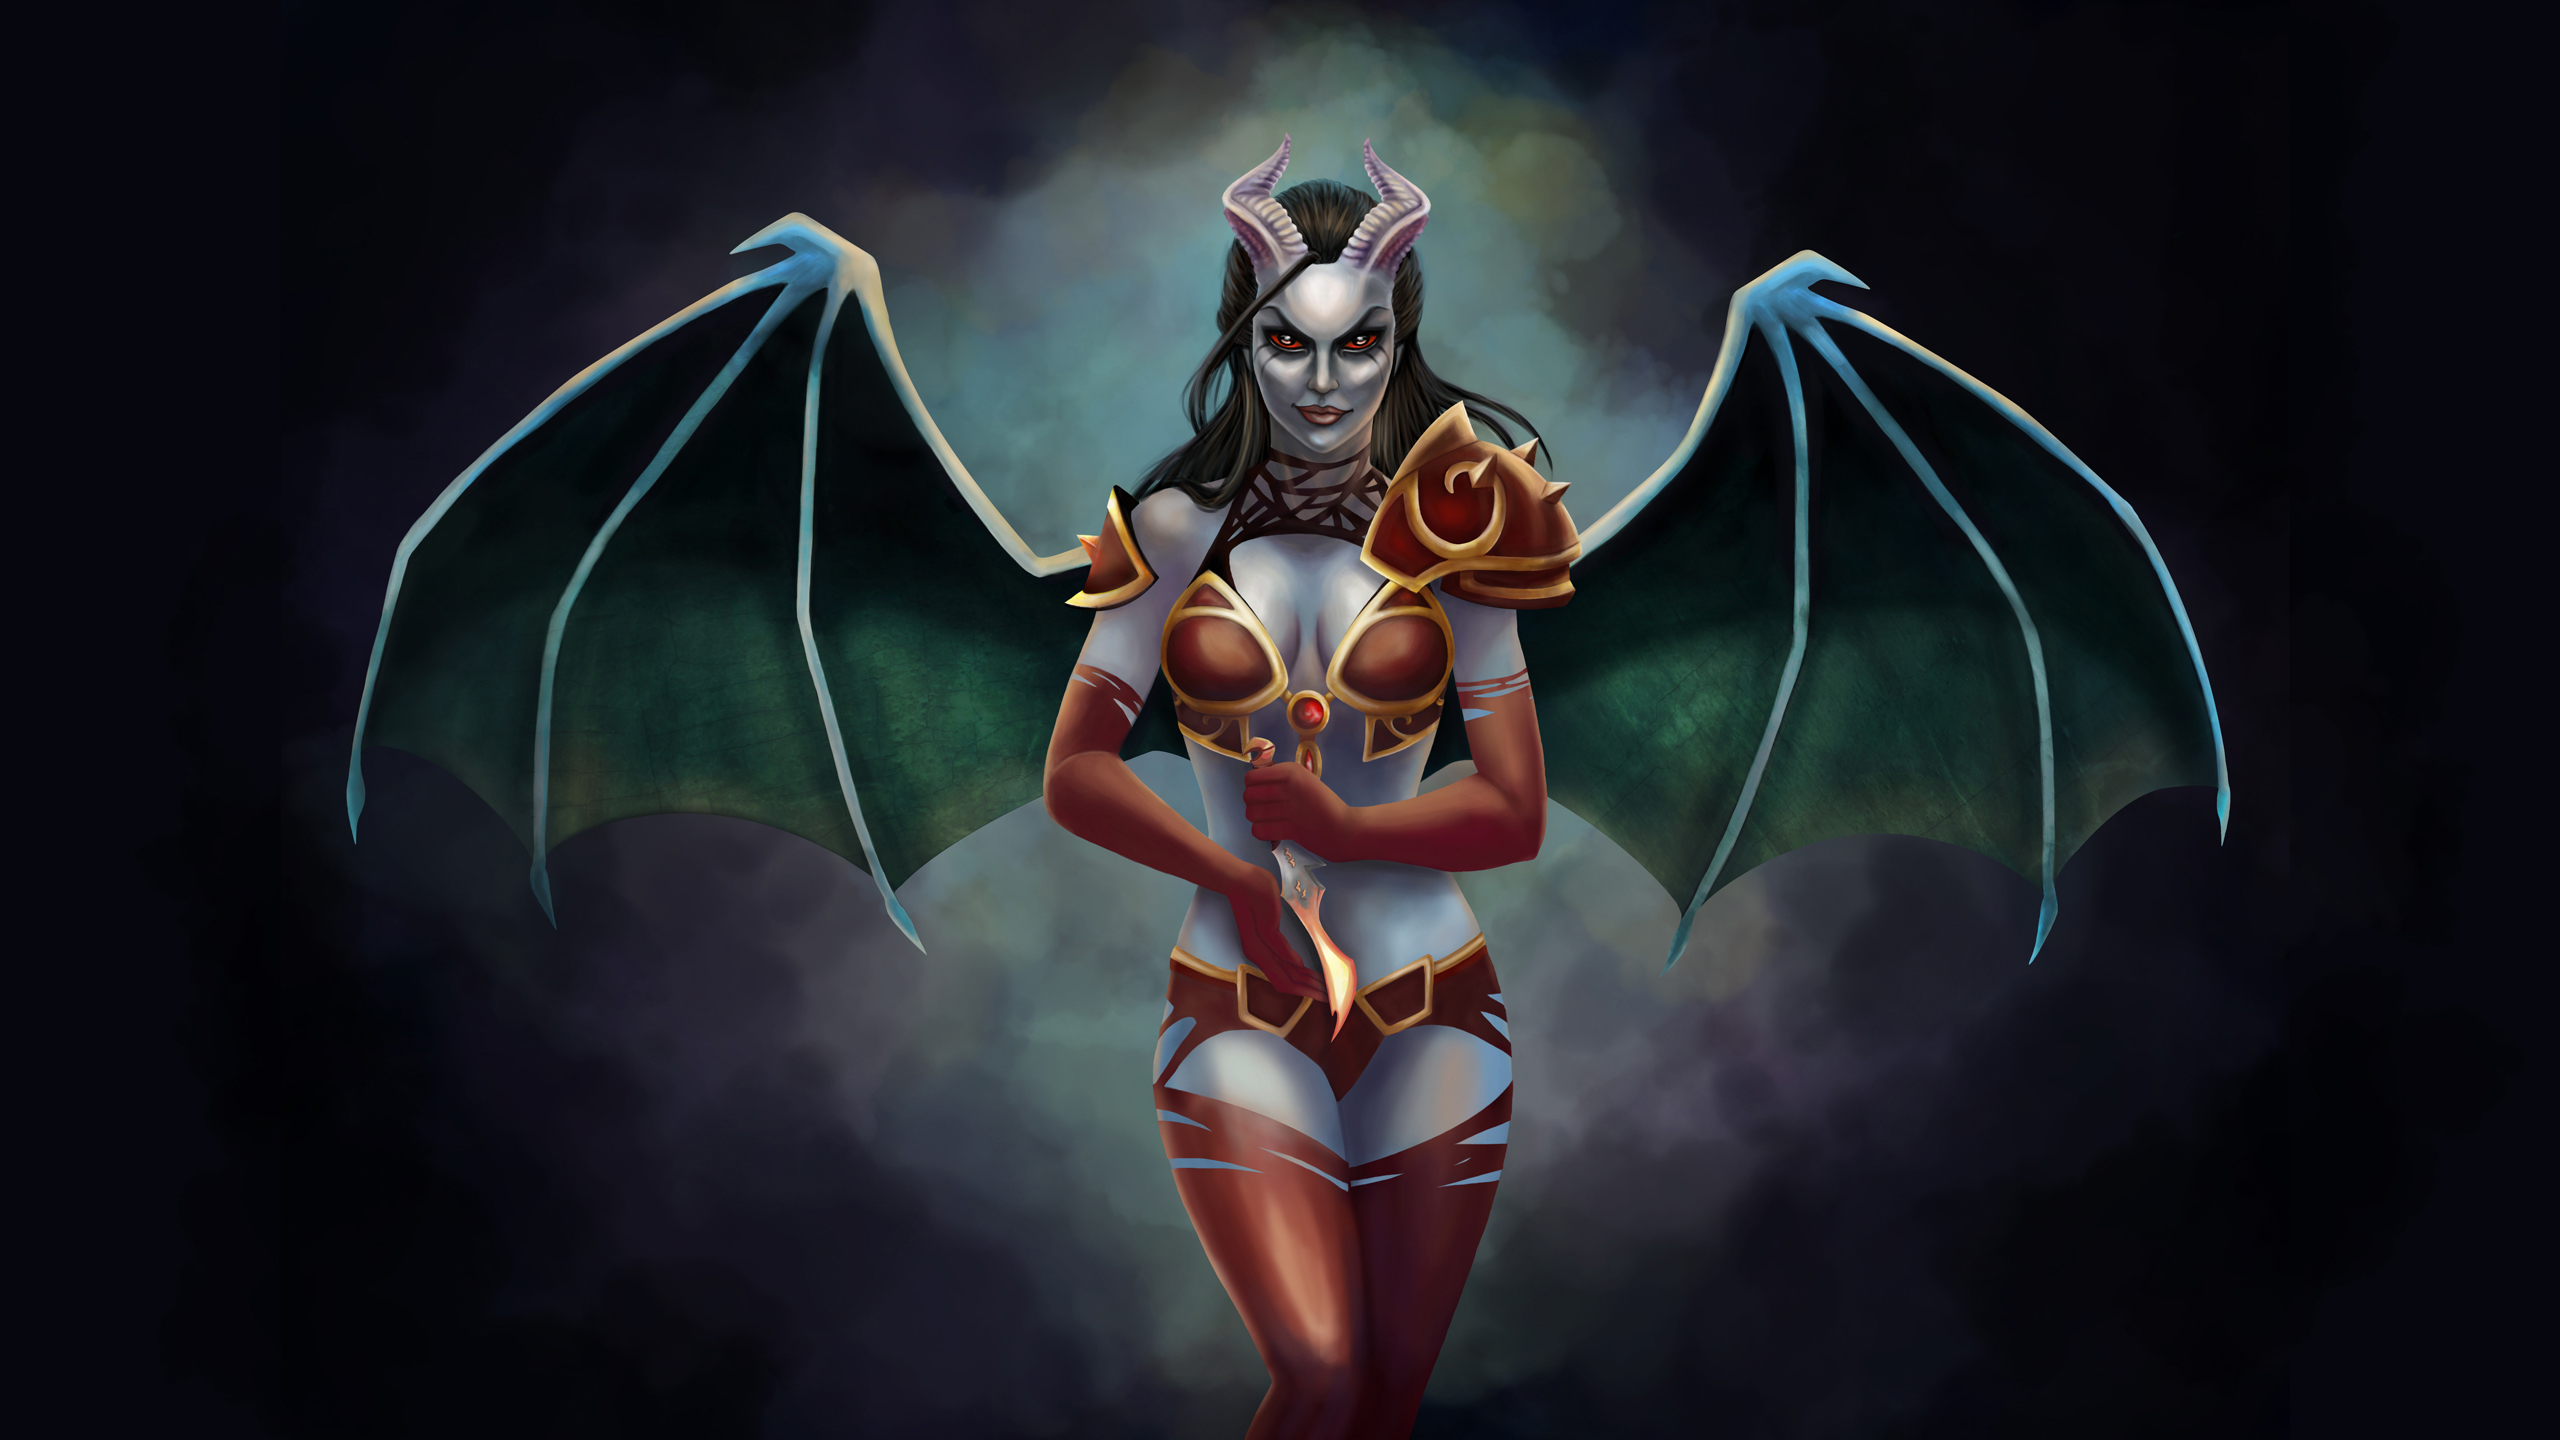 Dota 2 Queen Of Pain Hd Wallpaper Background Image